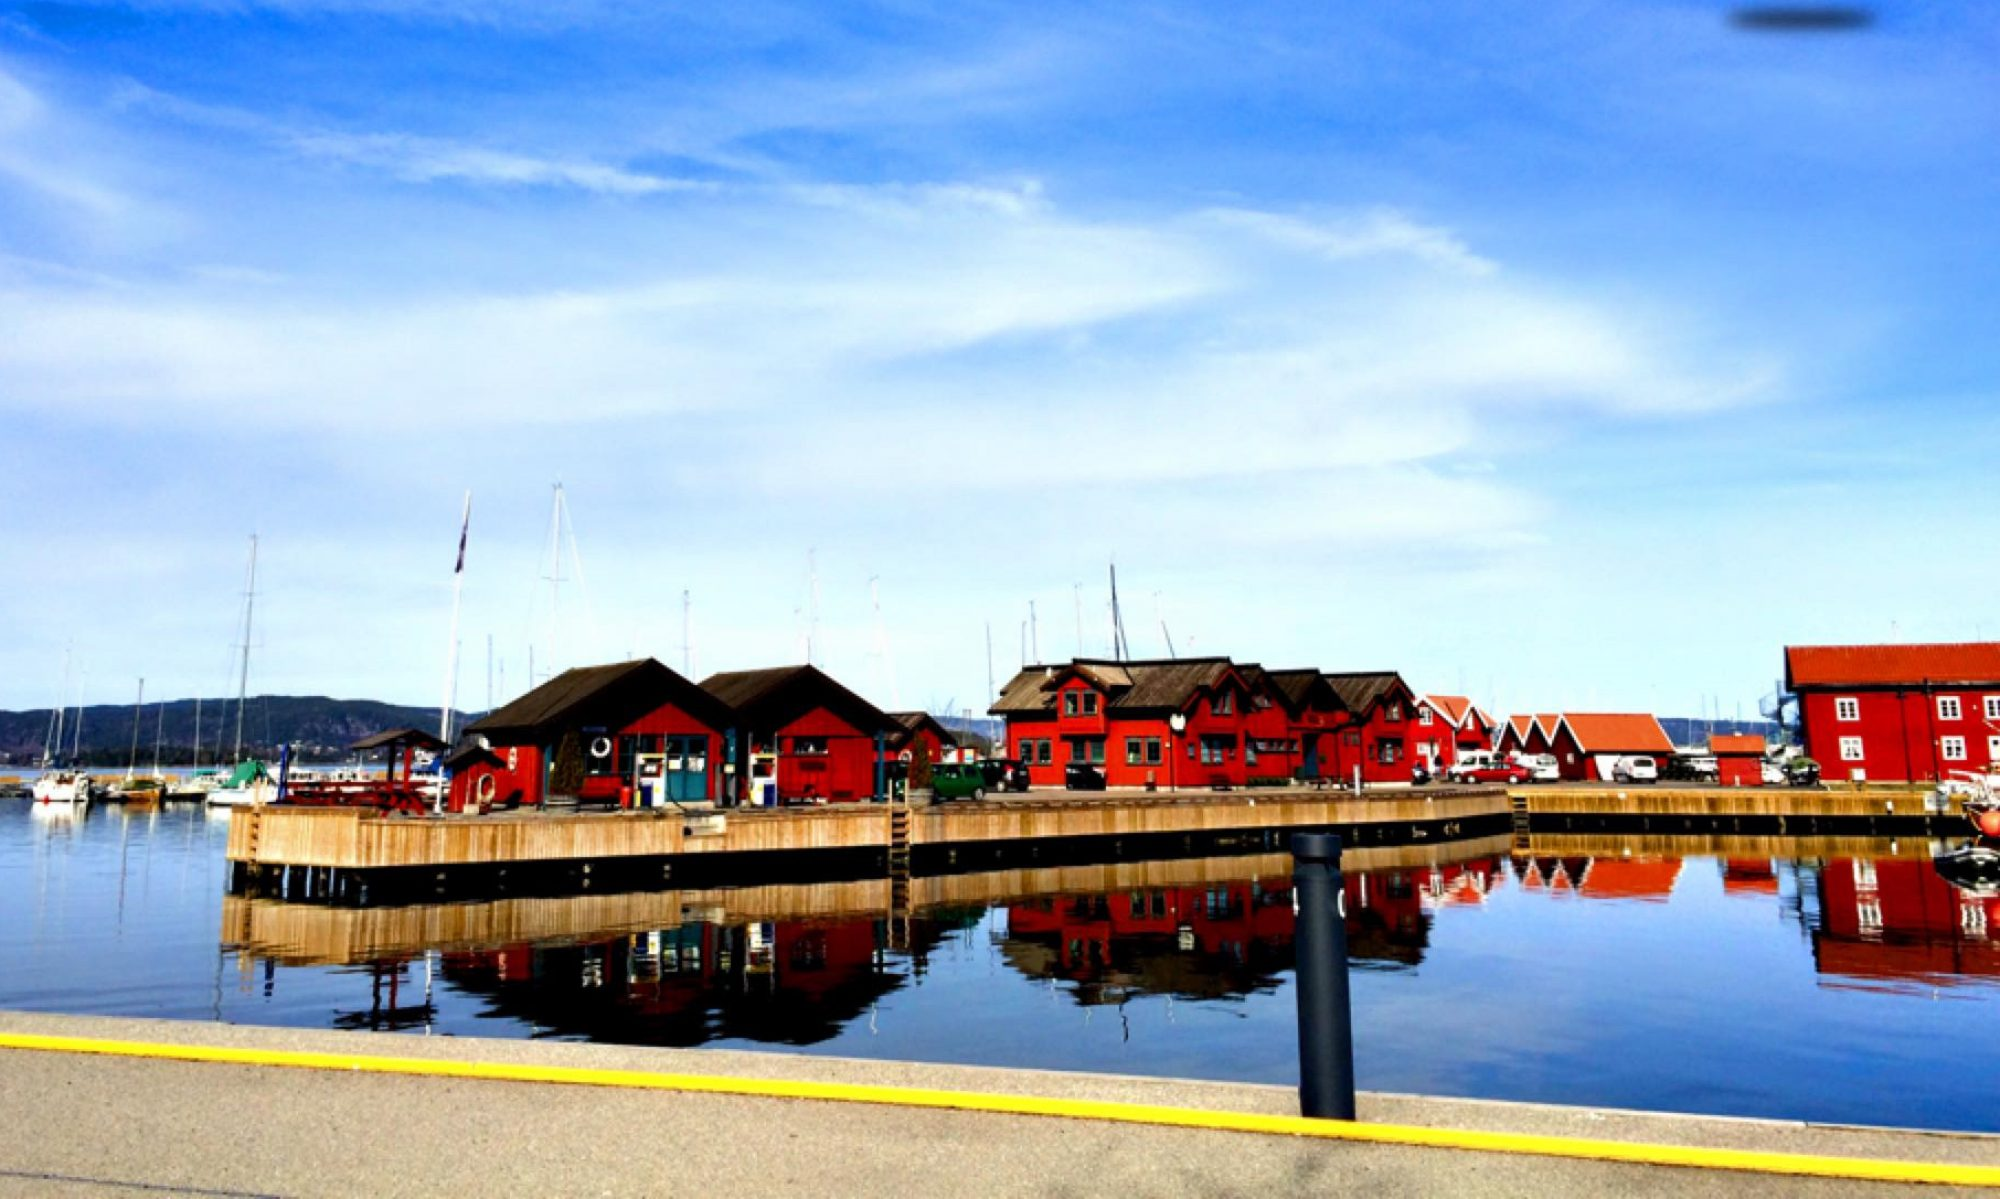 Holmestrand Båtforening